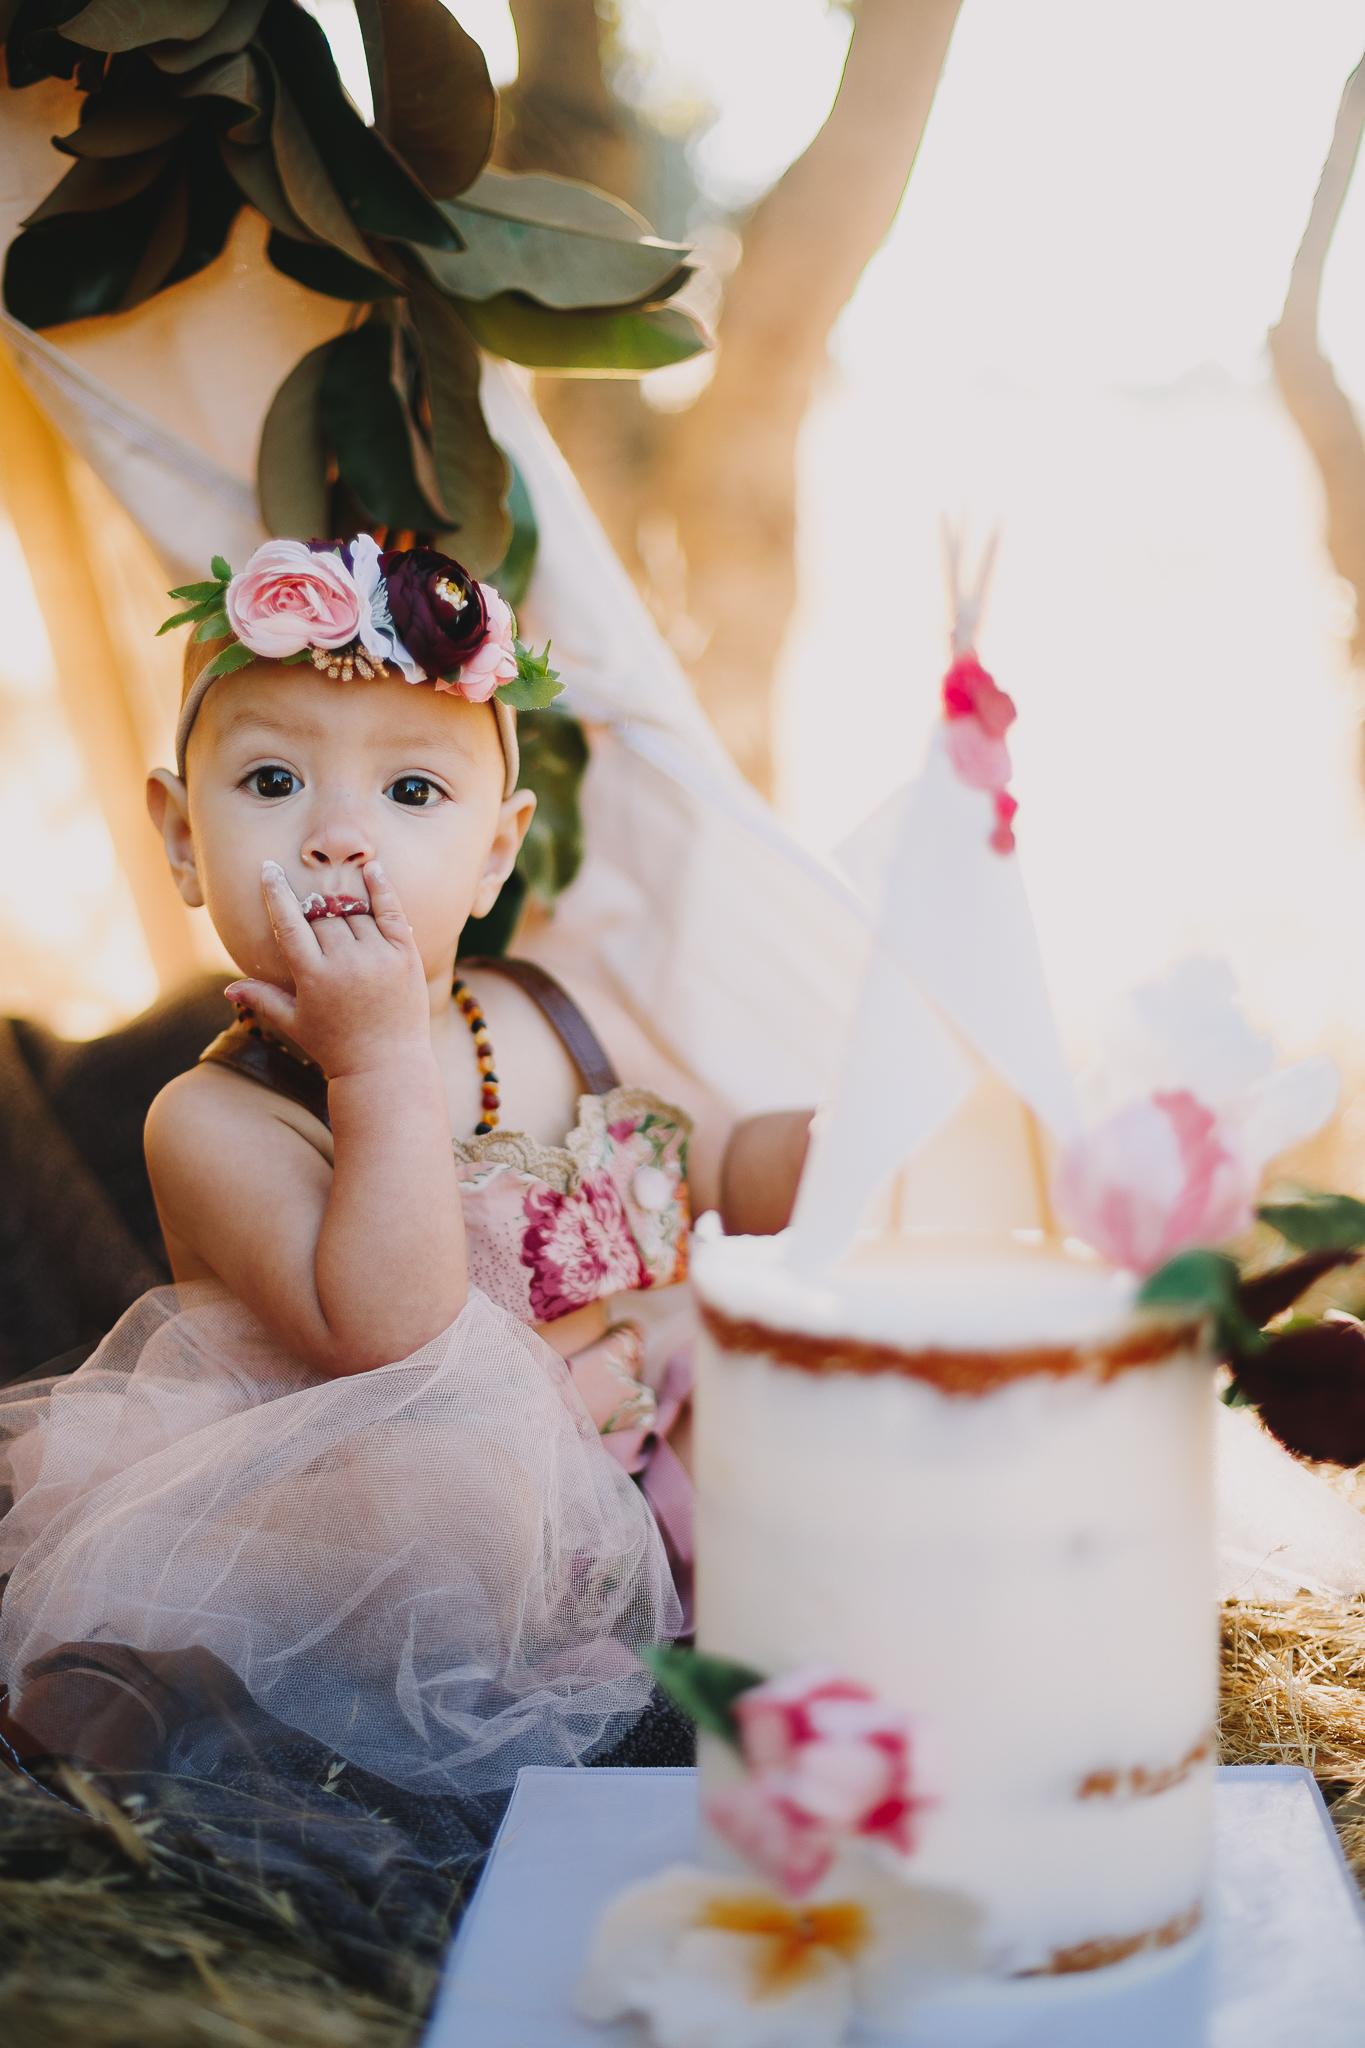 Archer_Inspired_Photography_Olivia_Daisy_Boho_Stylized_One_Year_Old_Cake_Smash_Shoot_Morgan_Hill_California-102.jpg